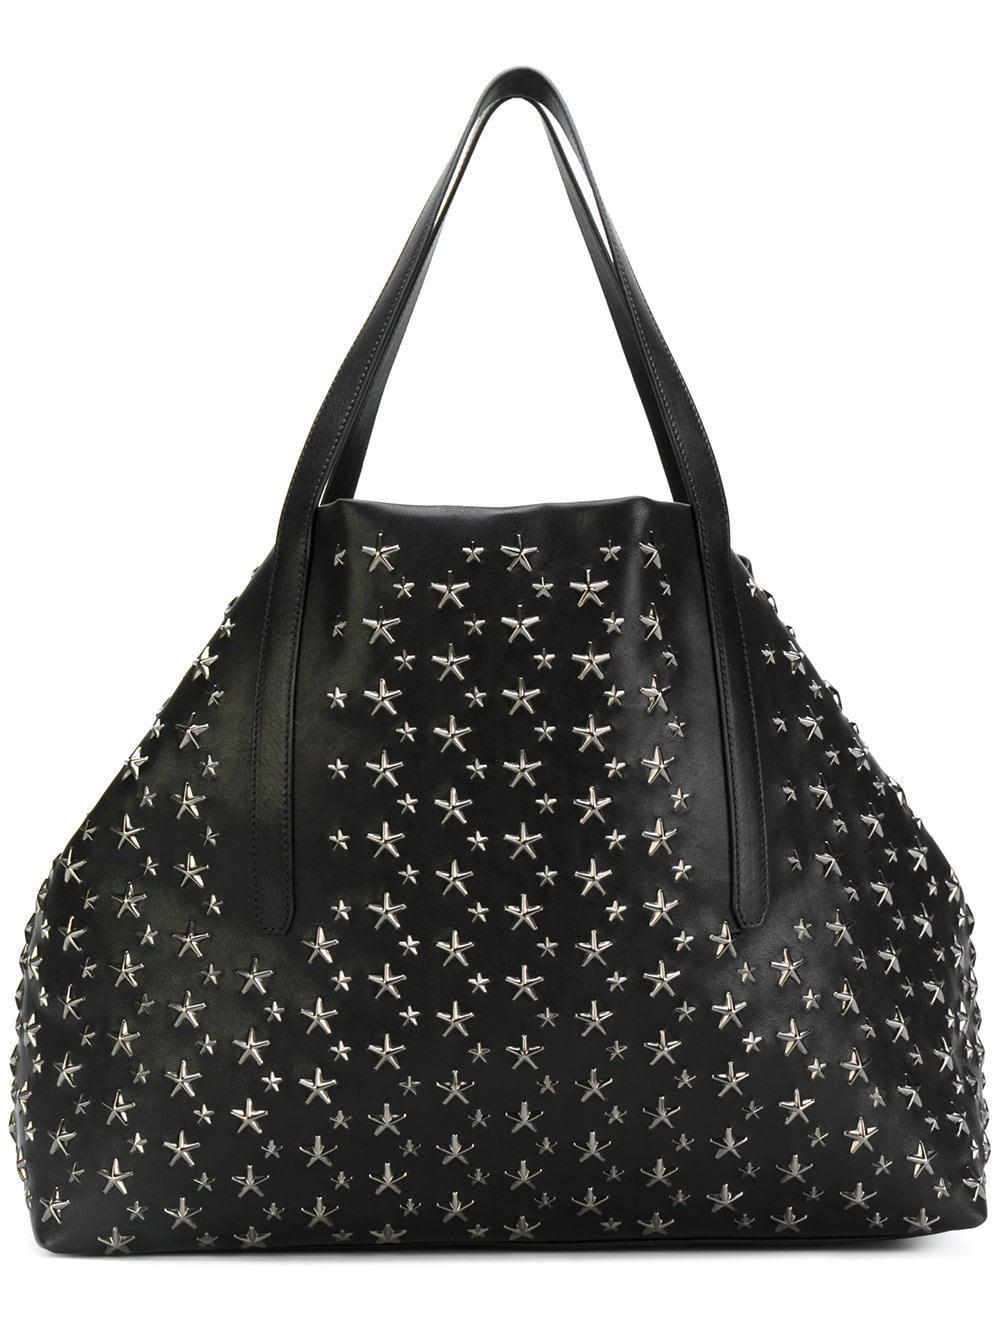 e86b67d09534 Jimmy Choo Pimlico Bag in Black for Men - Lyst